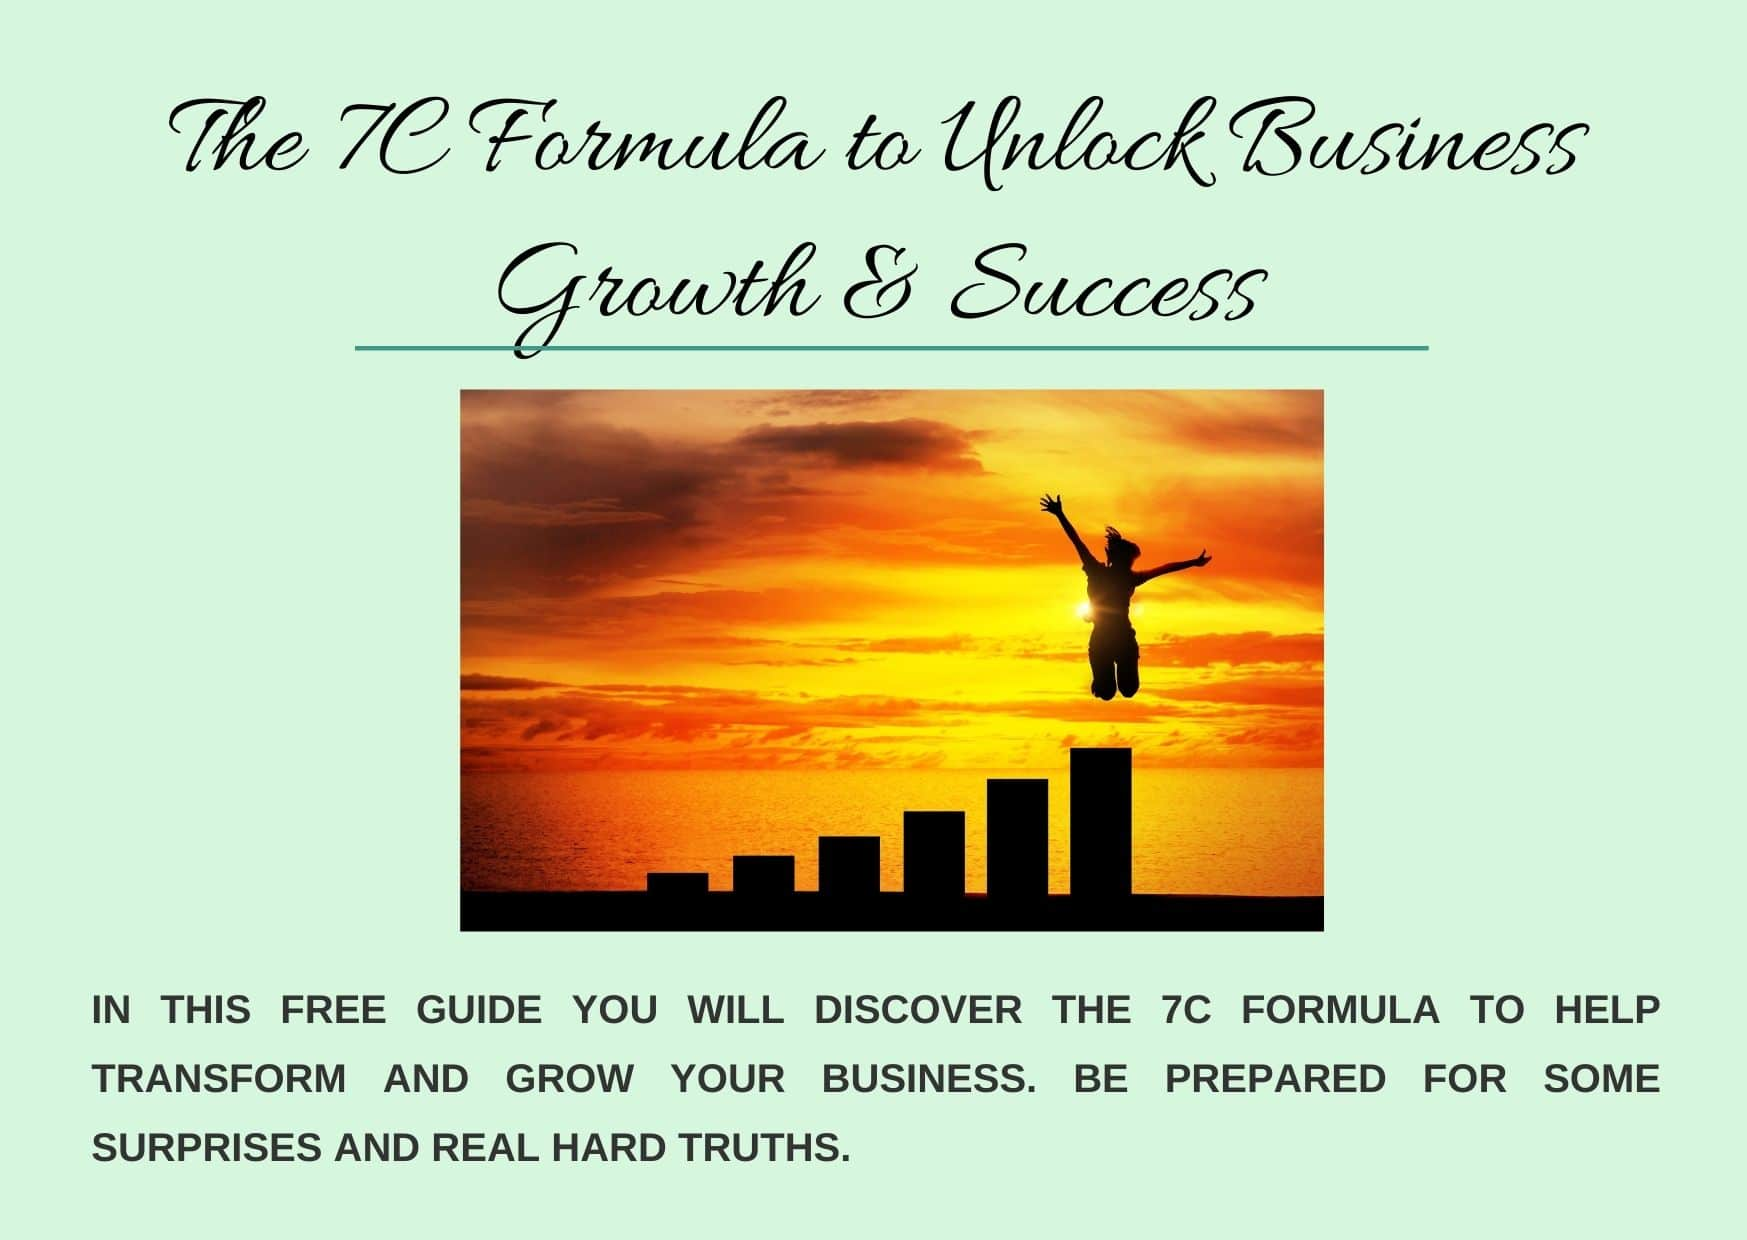 7C-Formula-Unlock-Business-Growth-Web-Image